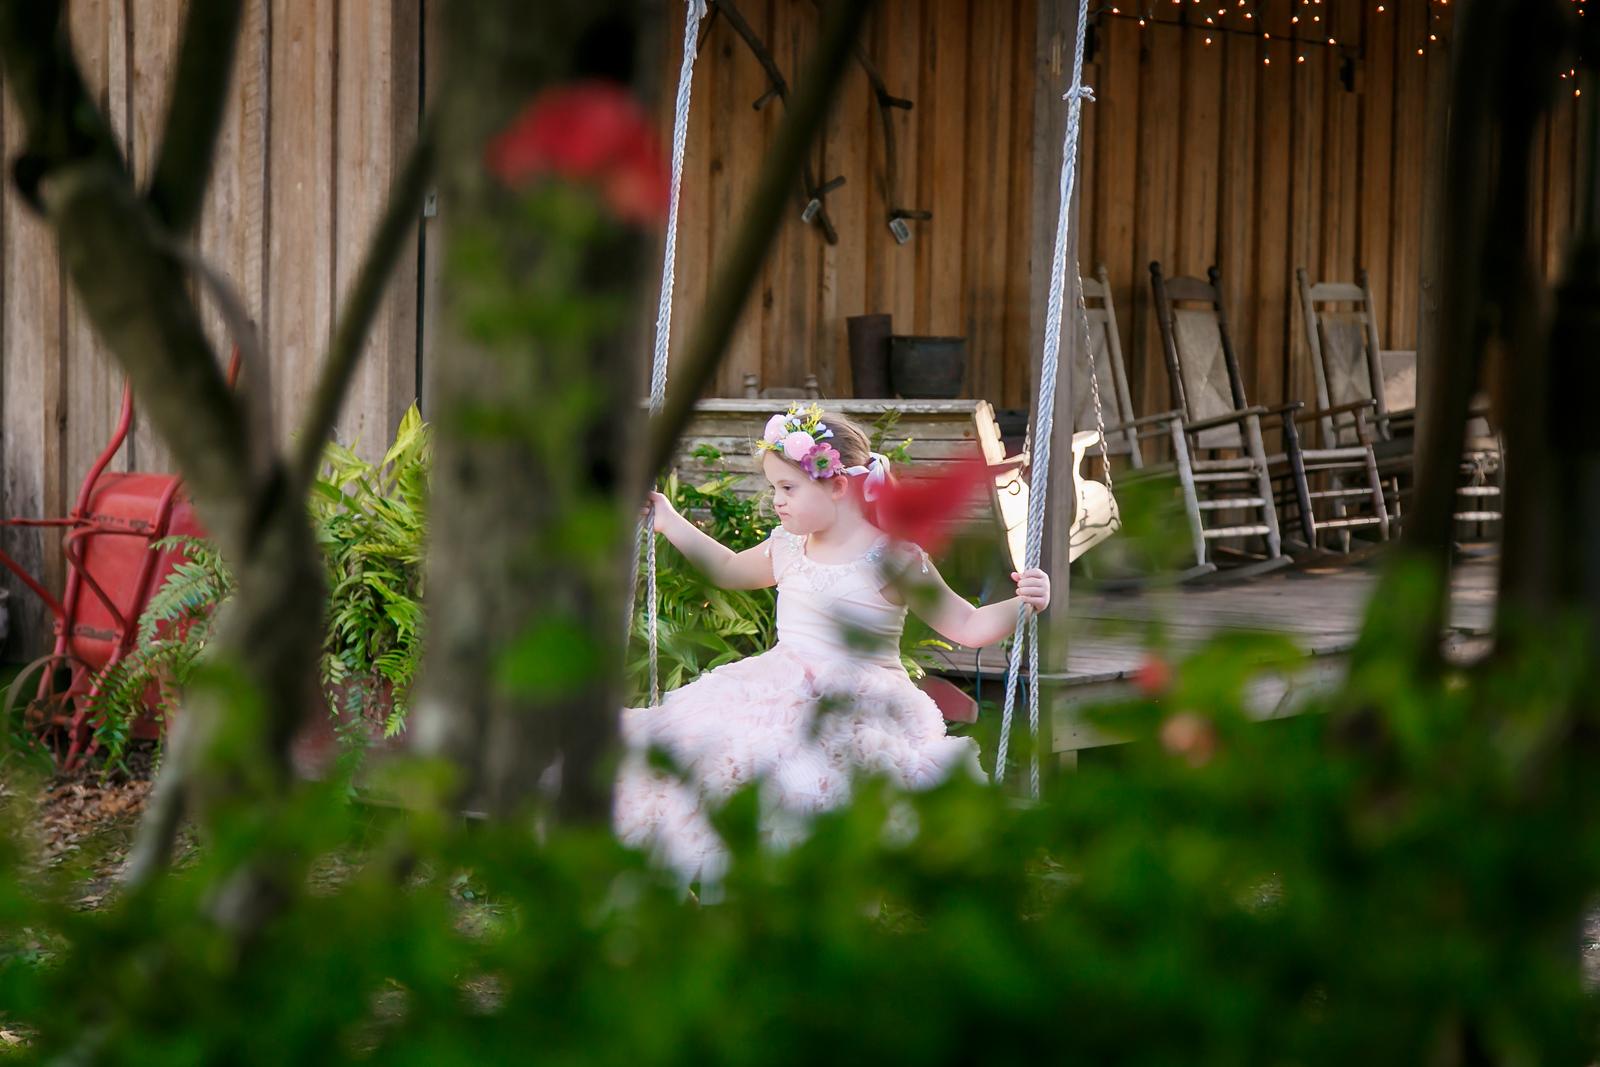 CAP2017-MadisonKyle-WEDDING-Giselle-TuckersFarmhouse-1001